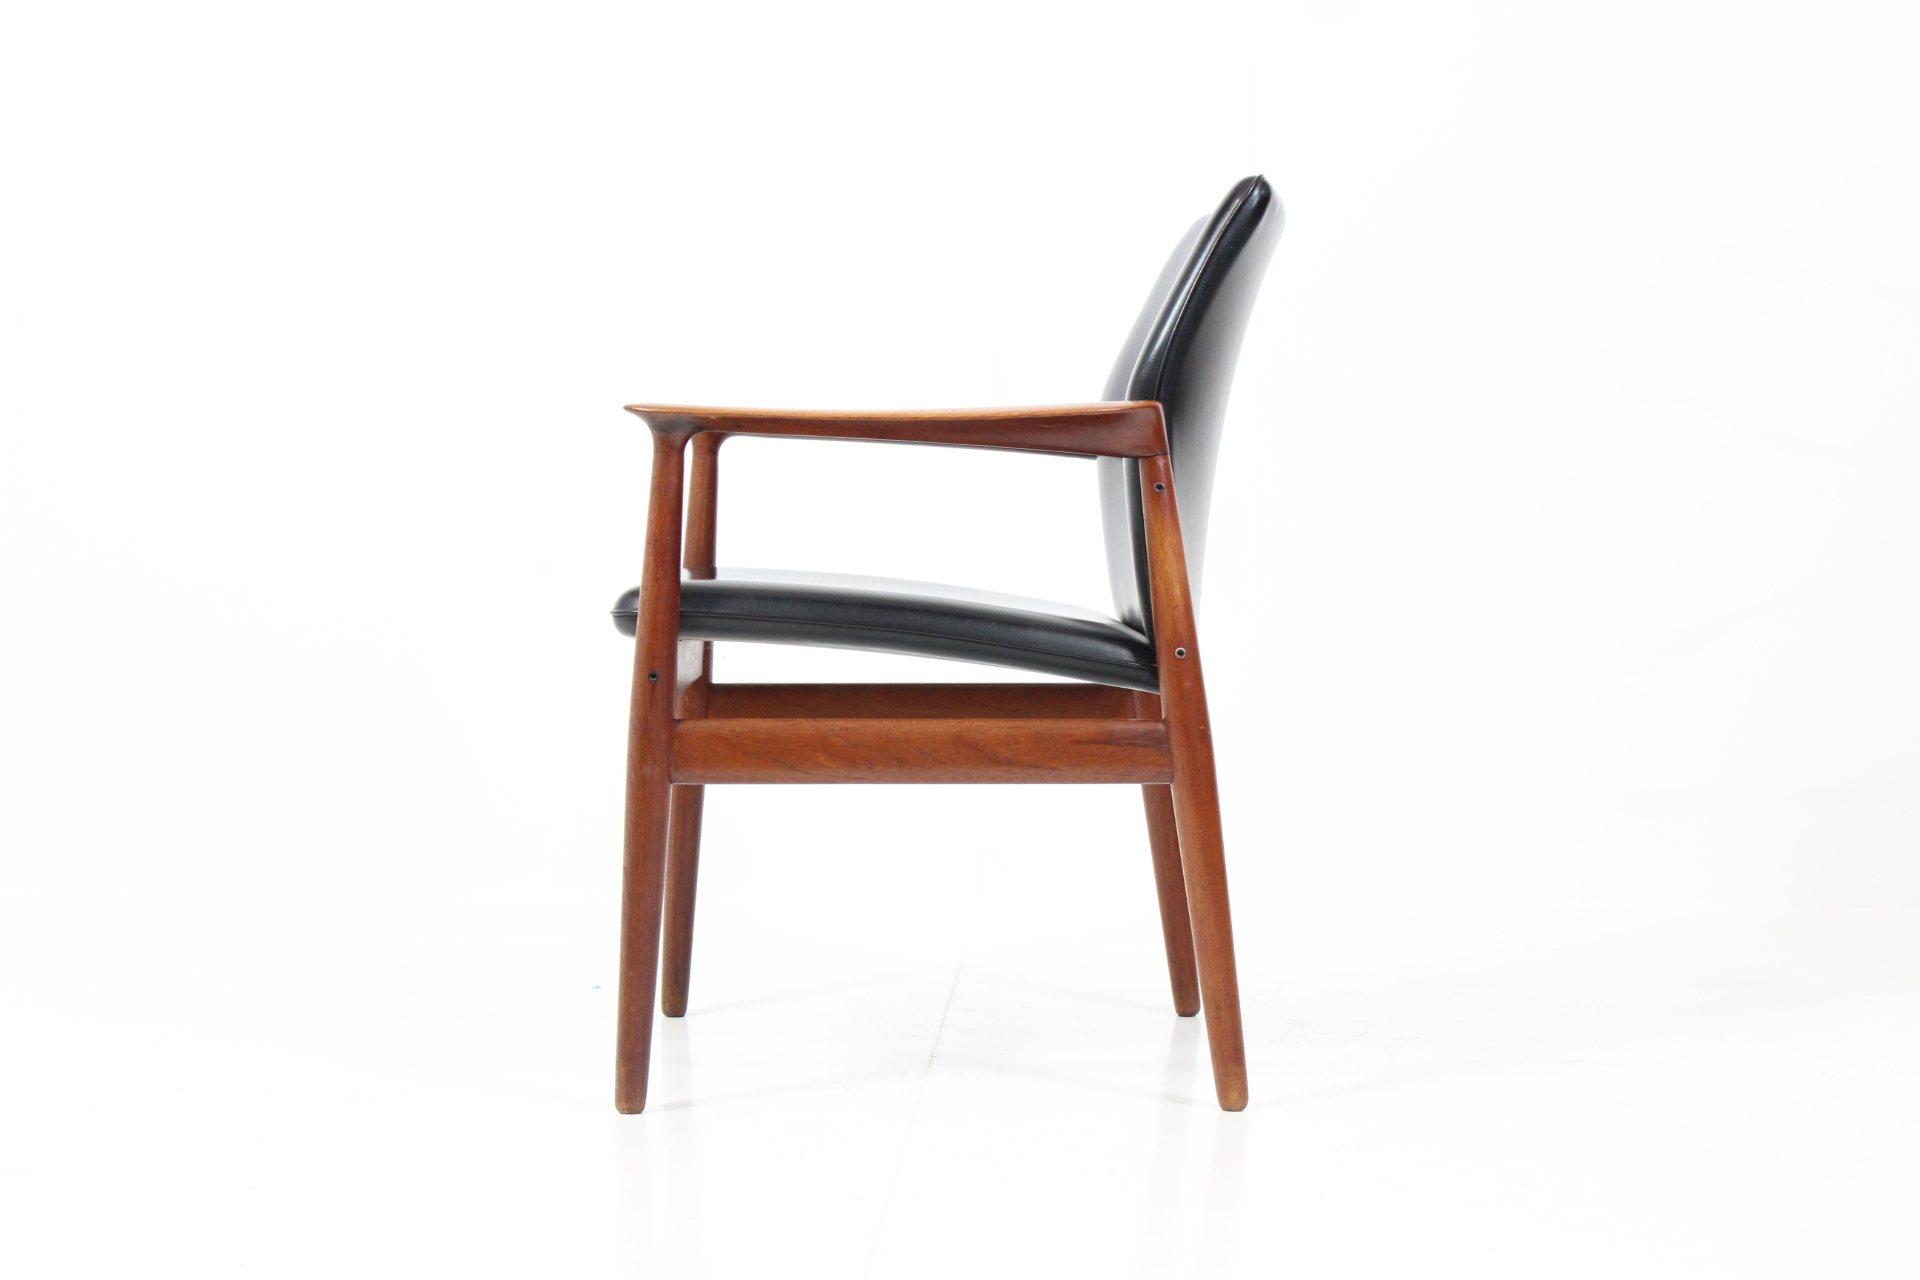 Retro Vintage Armchair by Grete J. Jalk for Glostrup Møbelfabrik